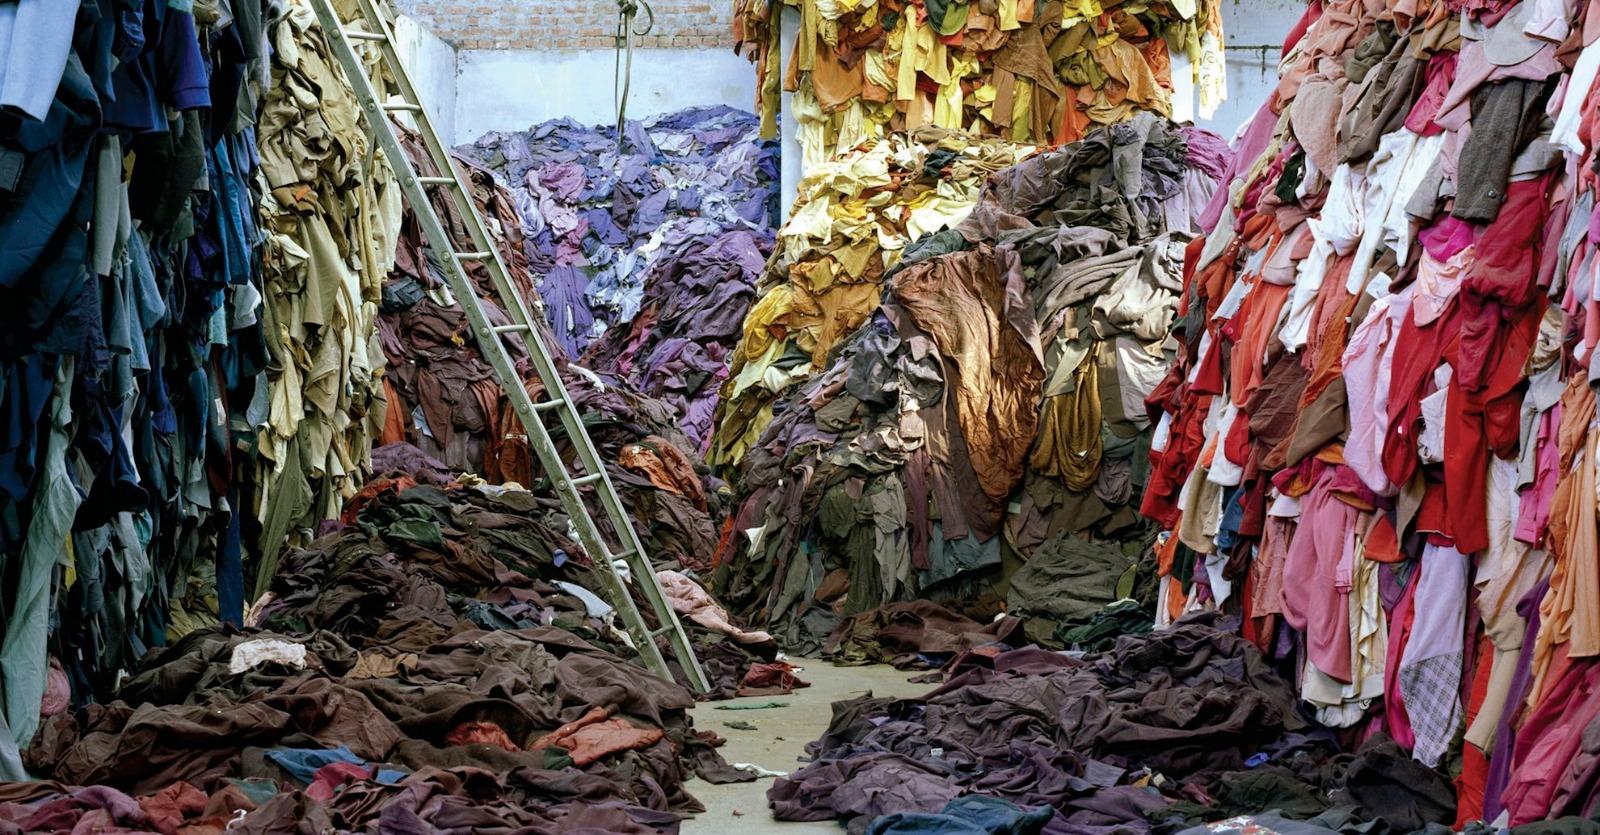 Limbah pakaian © Zerowaste.id